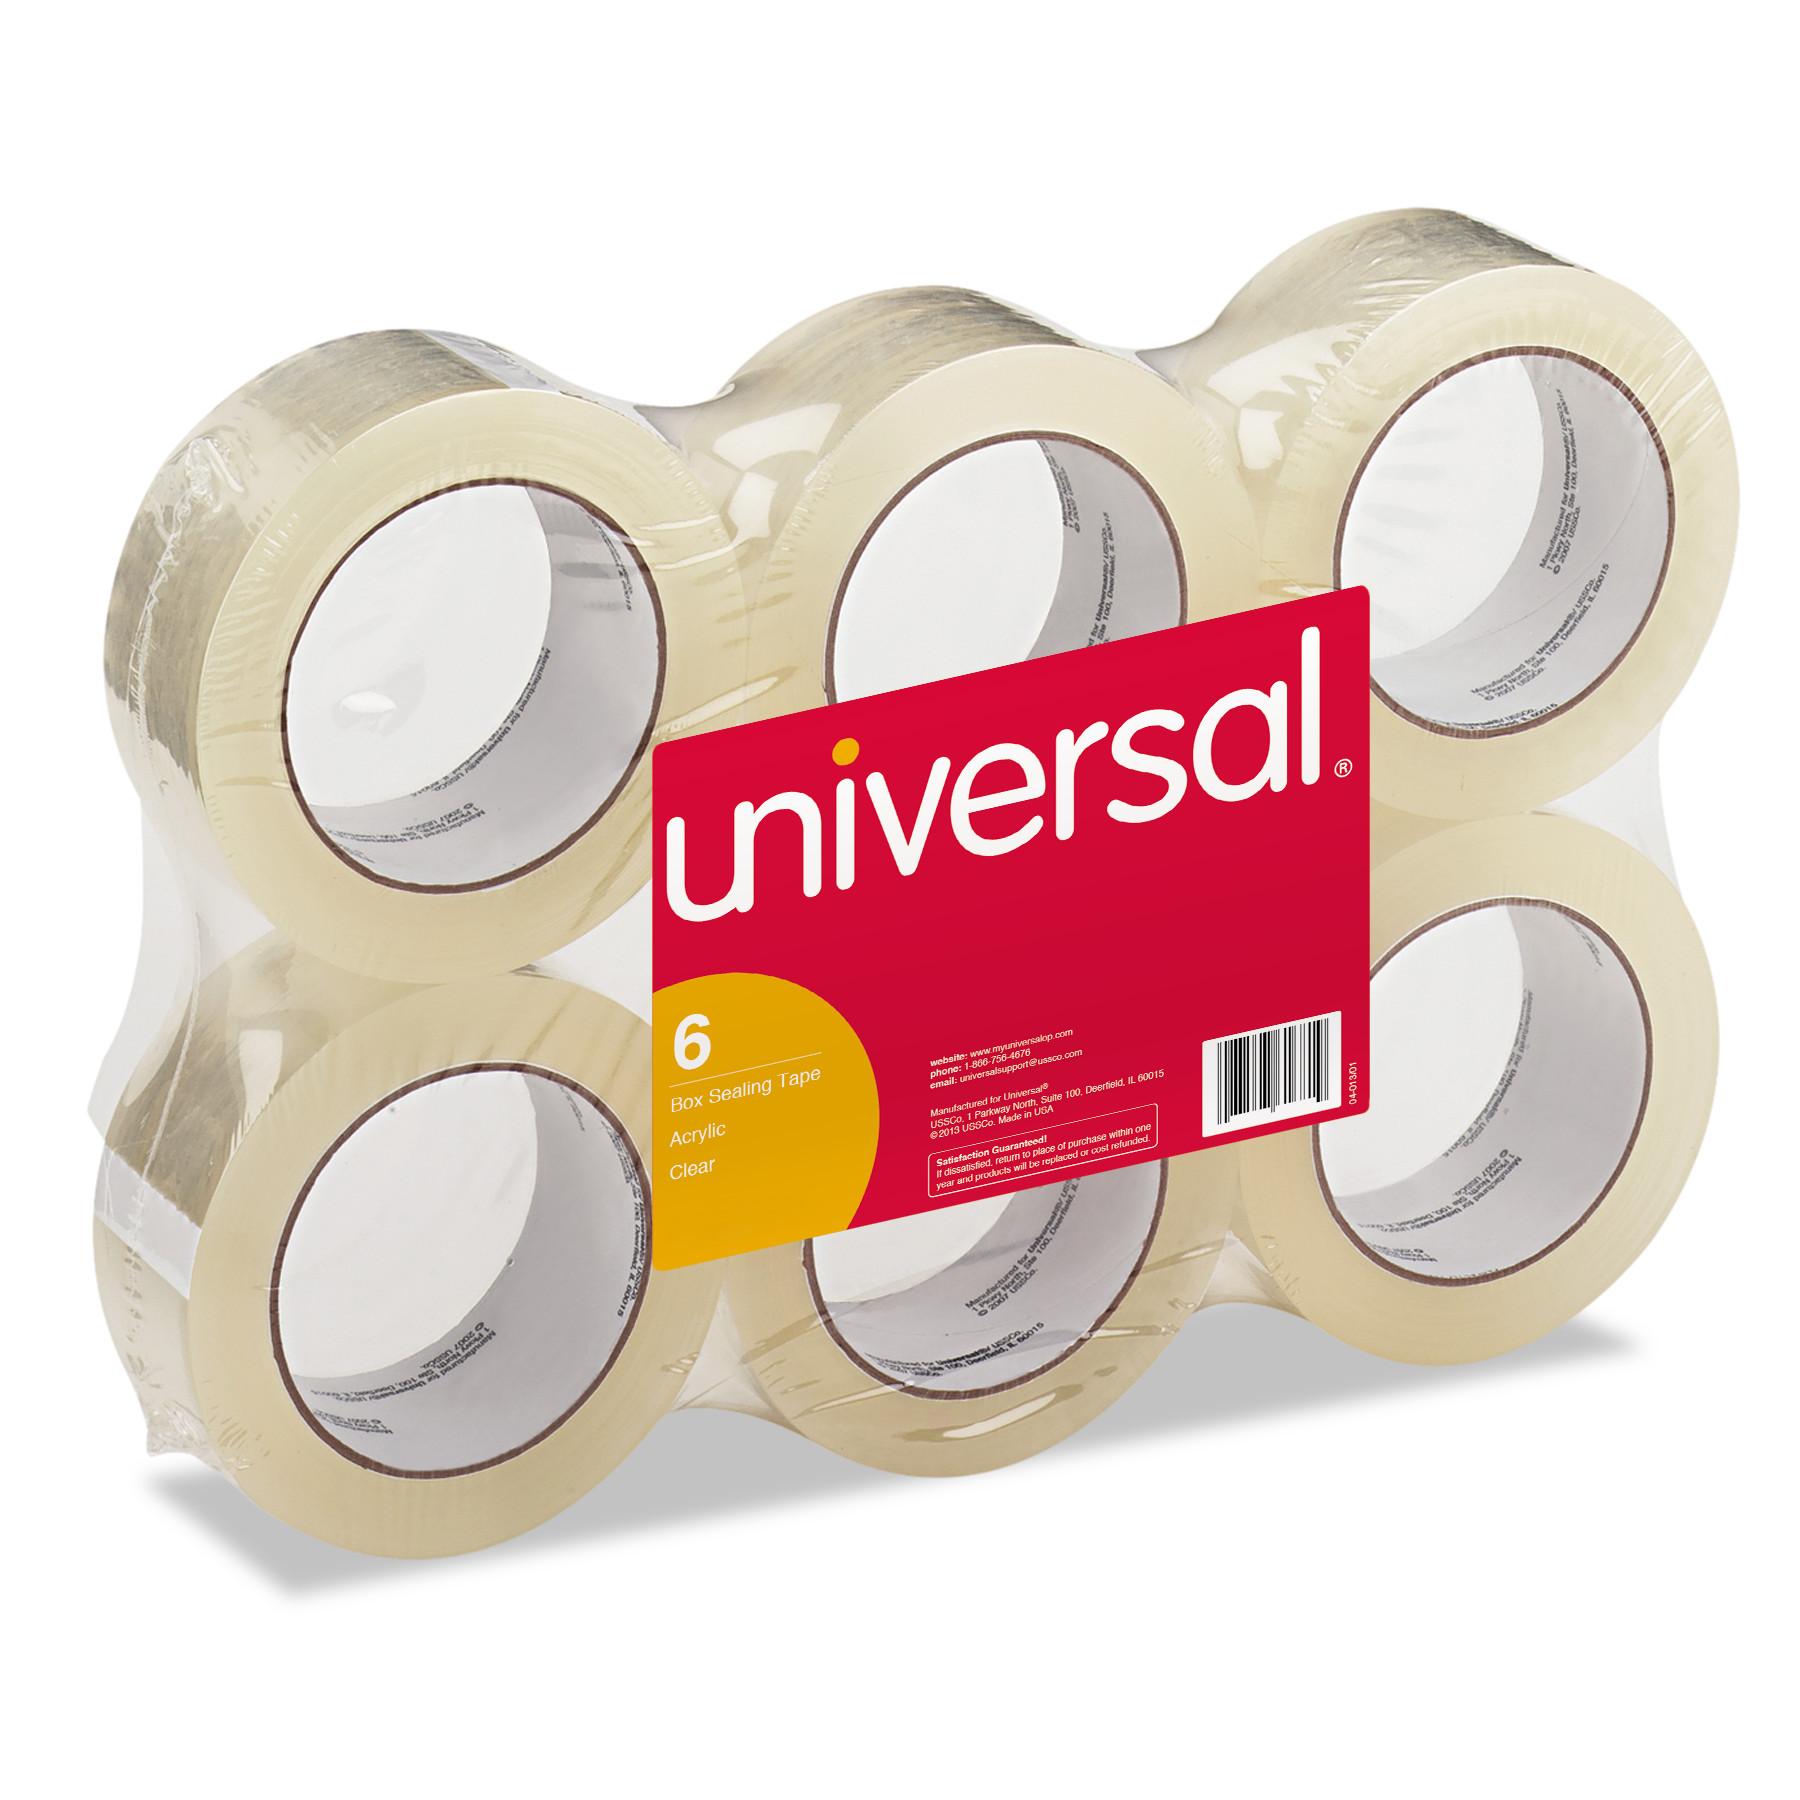 "General-Purpose Box Sealing Tape, 48mm x 100m, 3"" Core, Clear, 6/Pack"